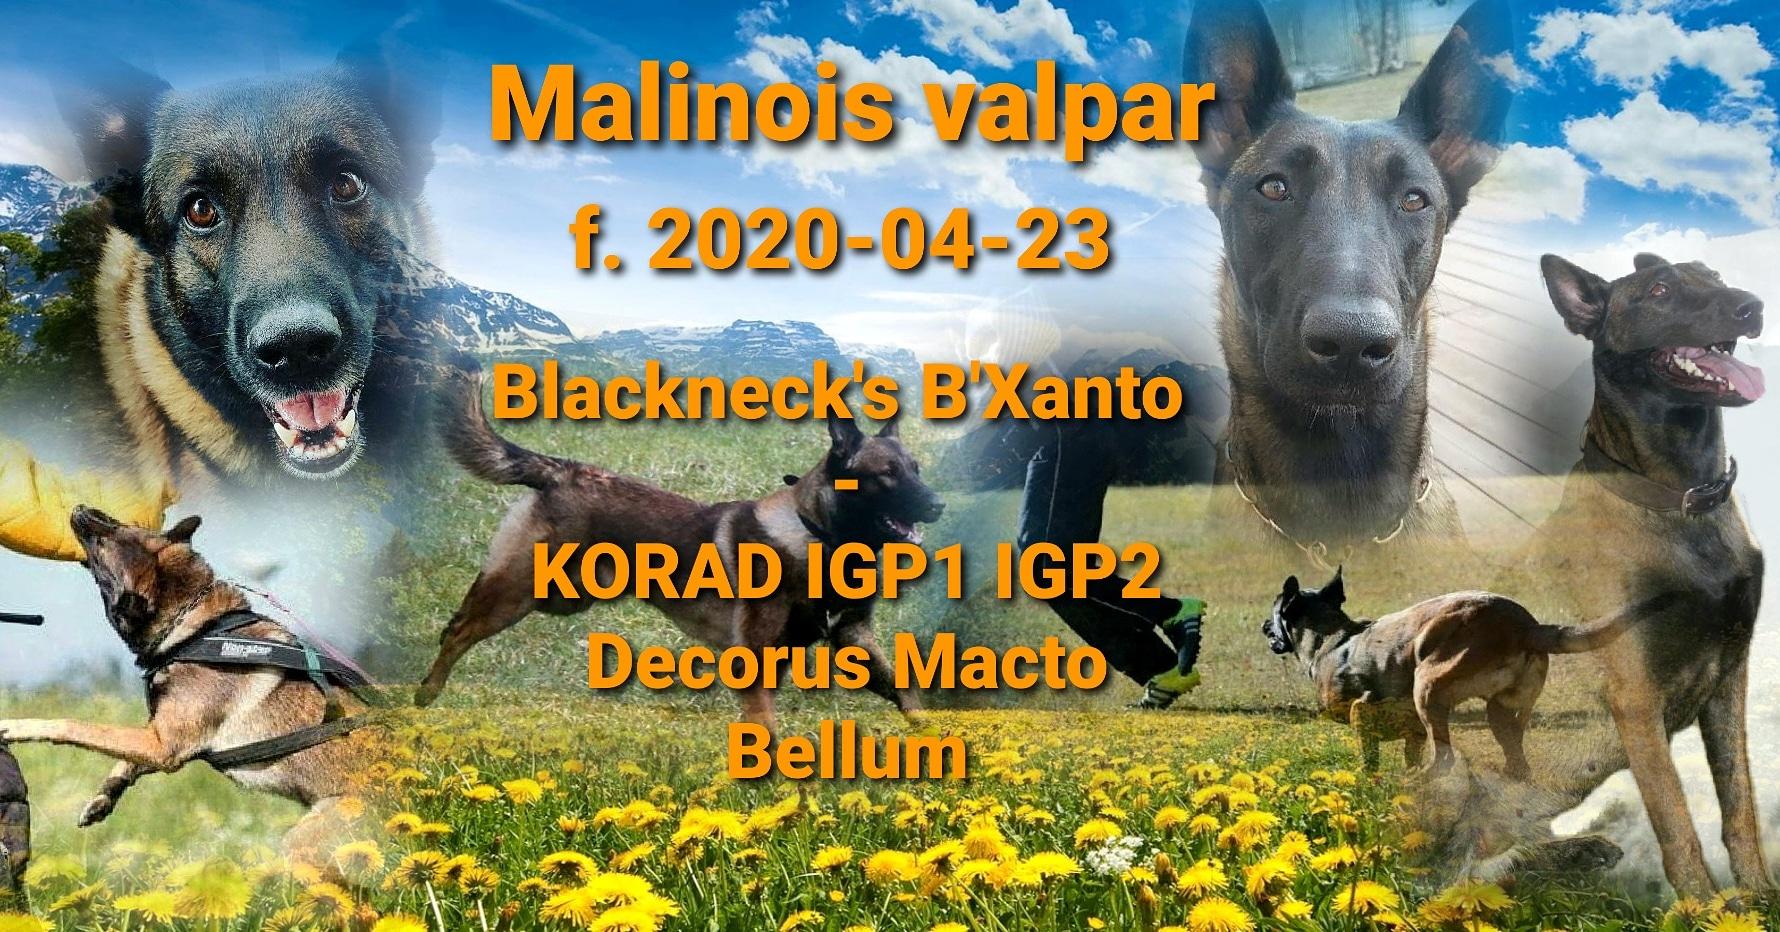 IMG_20200501_001346_672.jpg